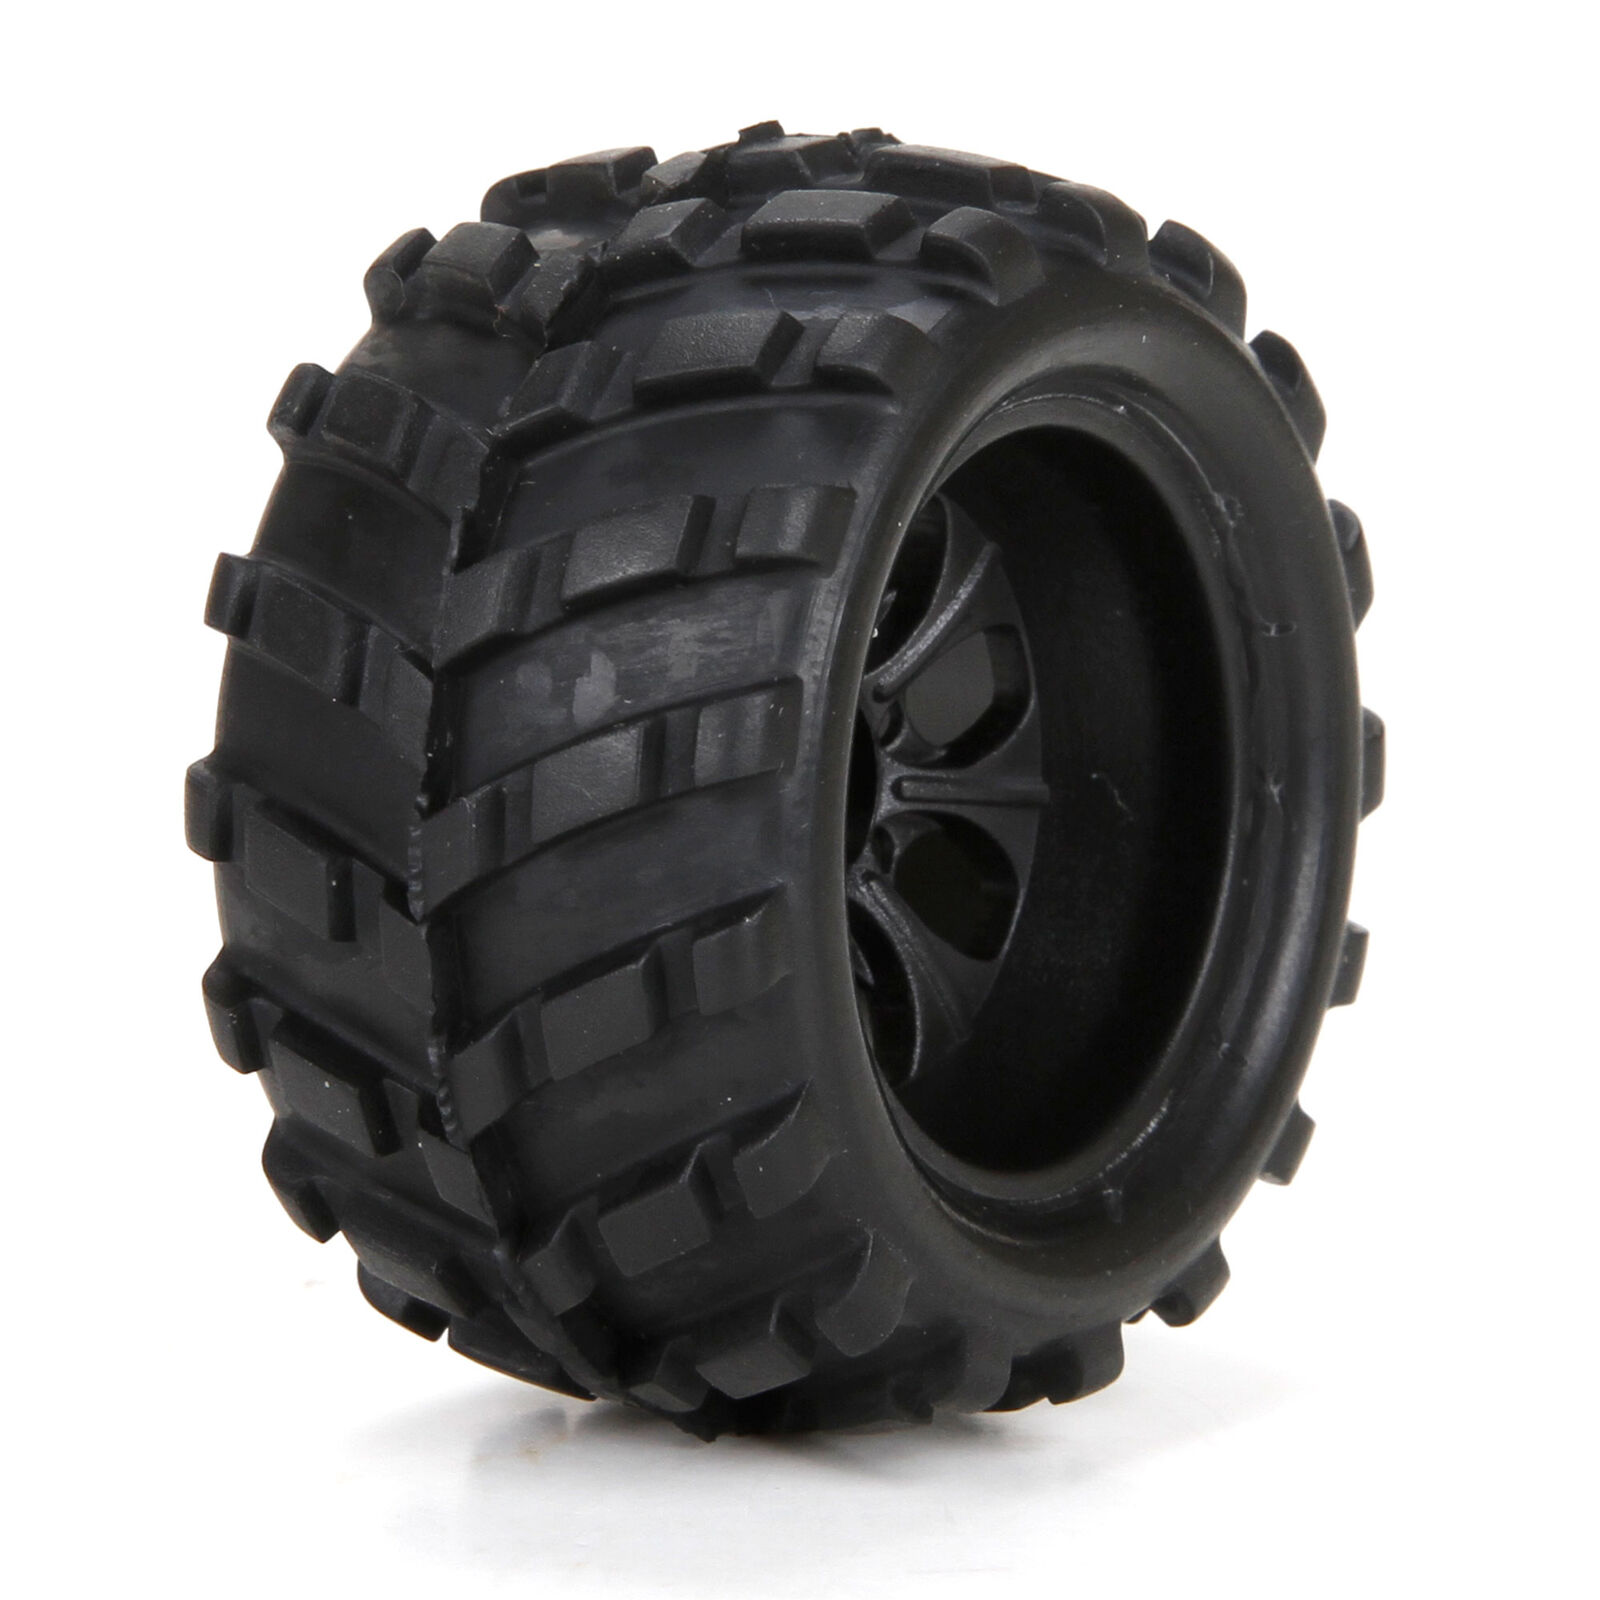 Front/Rear Premount Tire (2): 1/24 4WD Ruckus